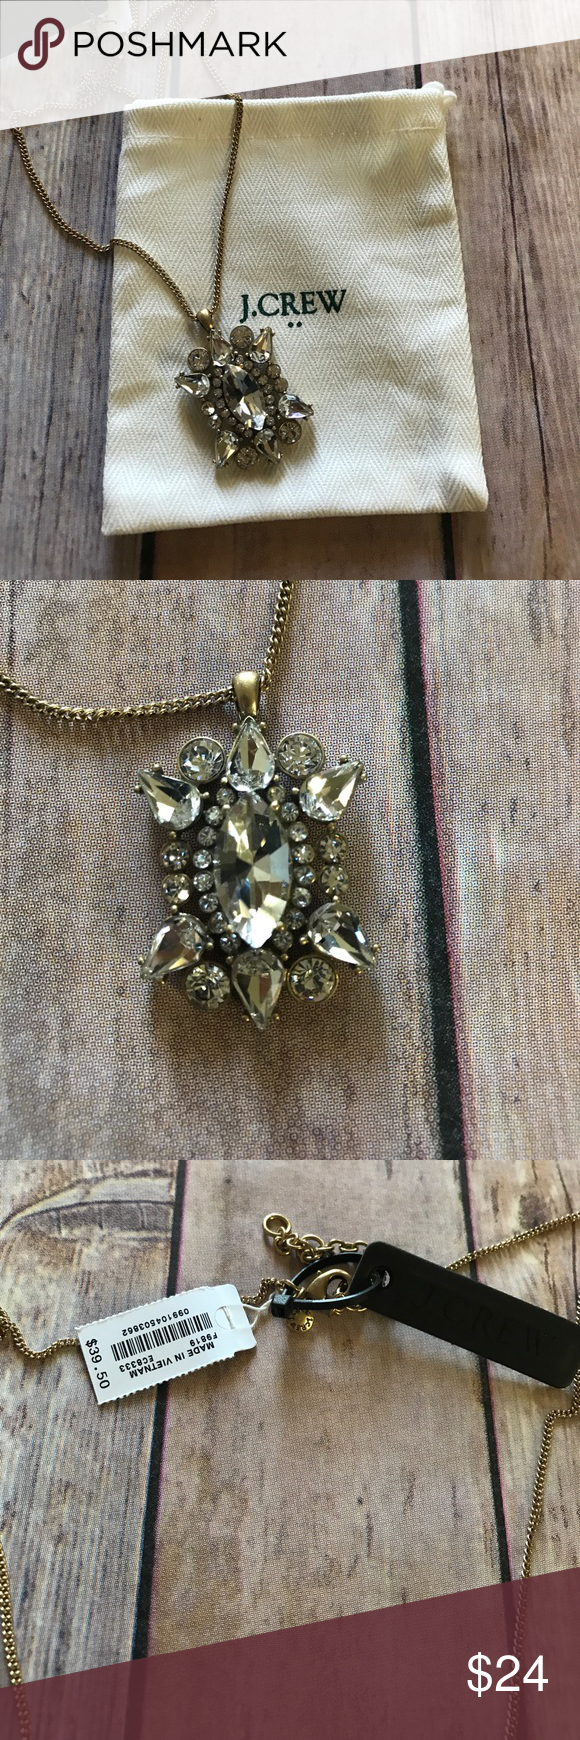 Sale jcrew stone necklace j crew factory beautiful stone pendant